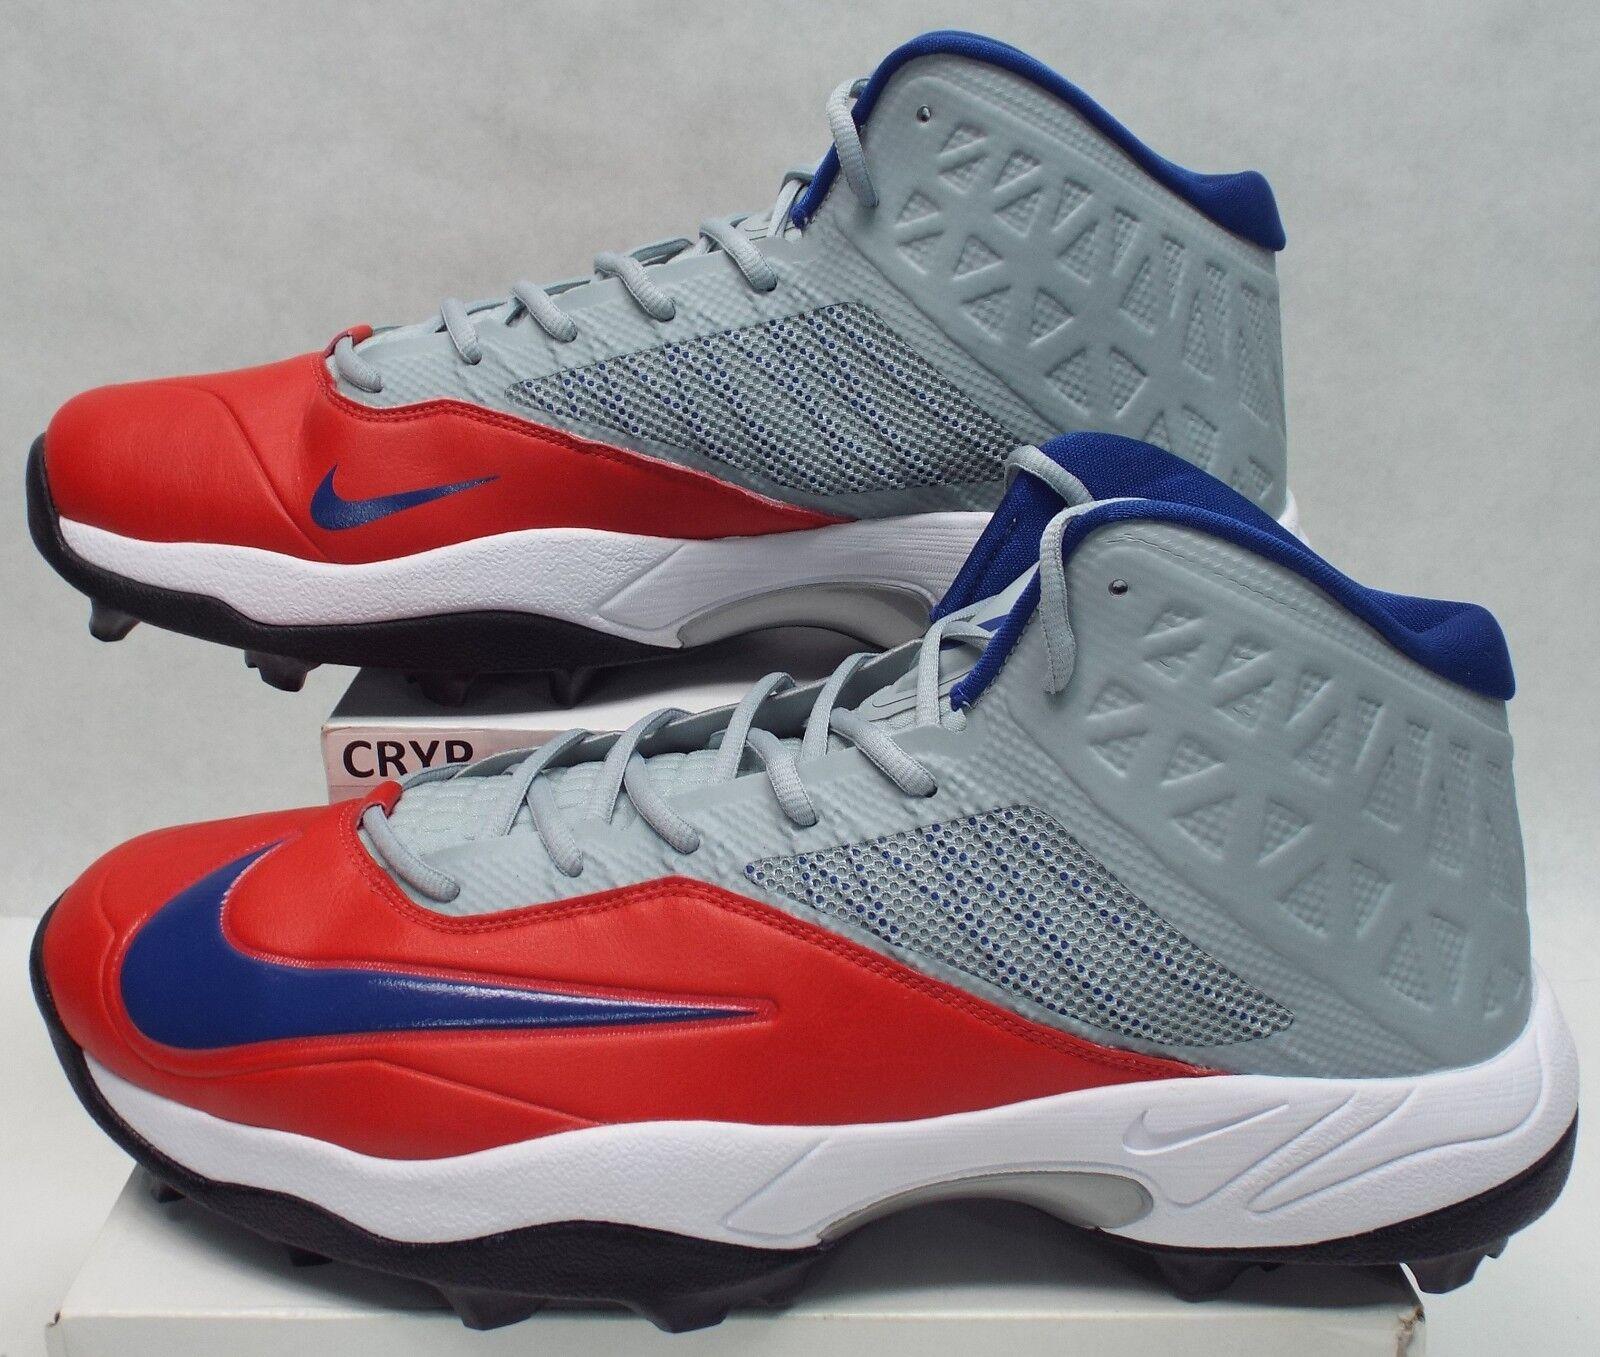 New Mens 17 NIKE Zoom Code Elite 3 4 Shark Cleats shoes  105 618140-021